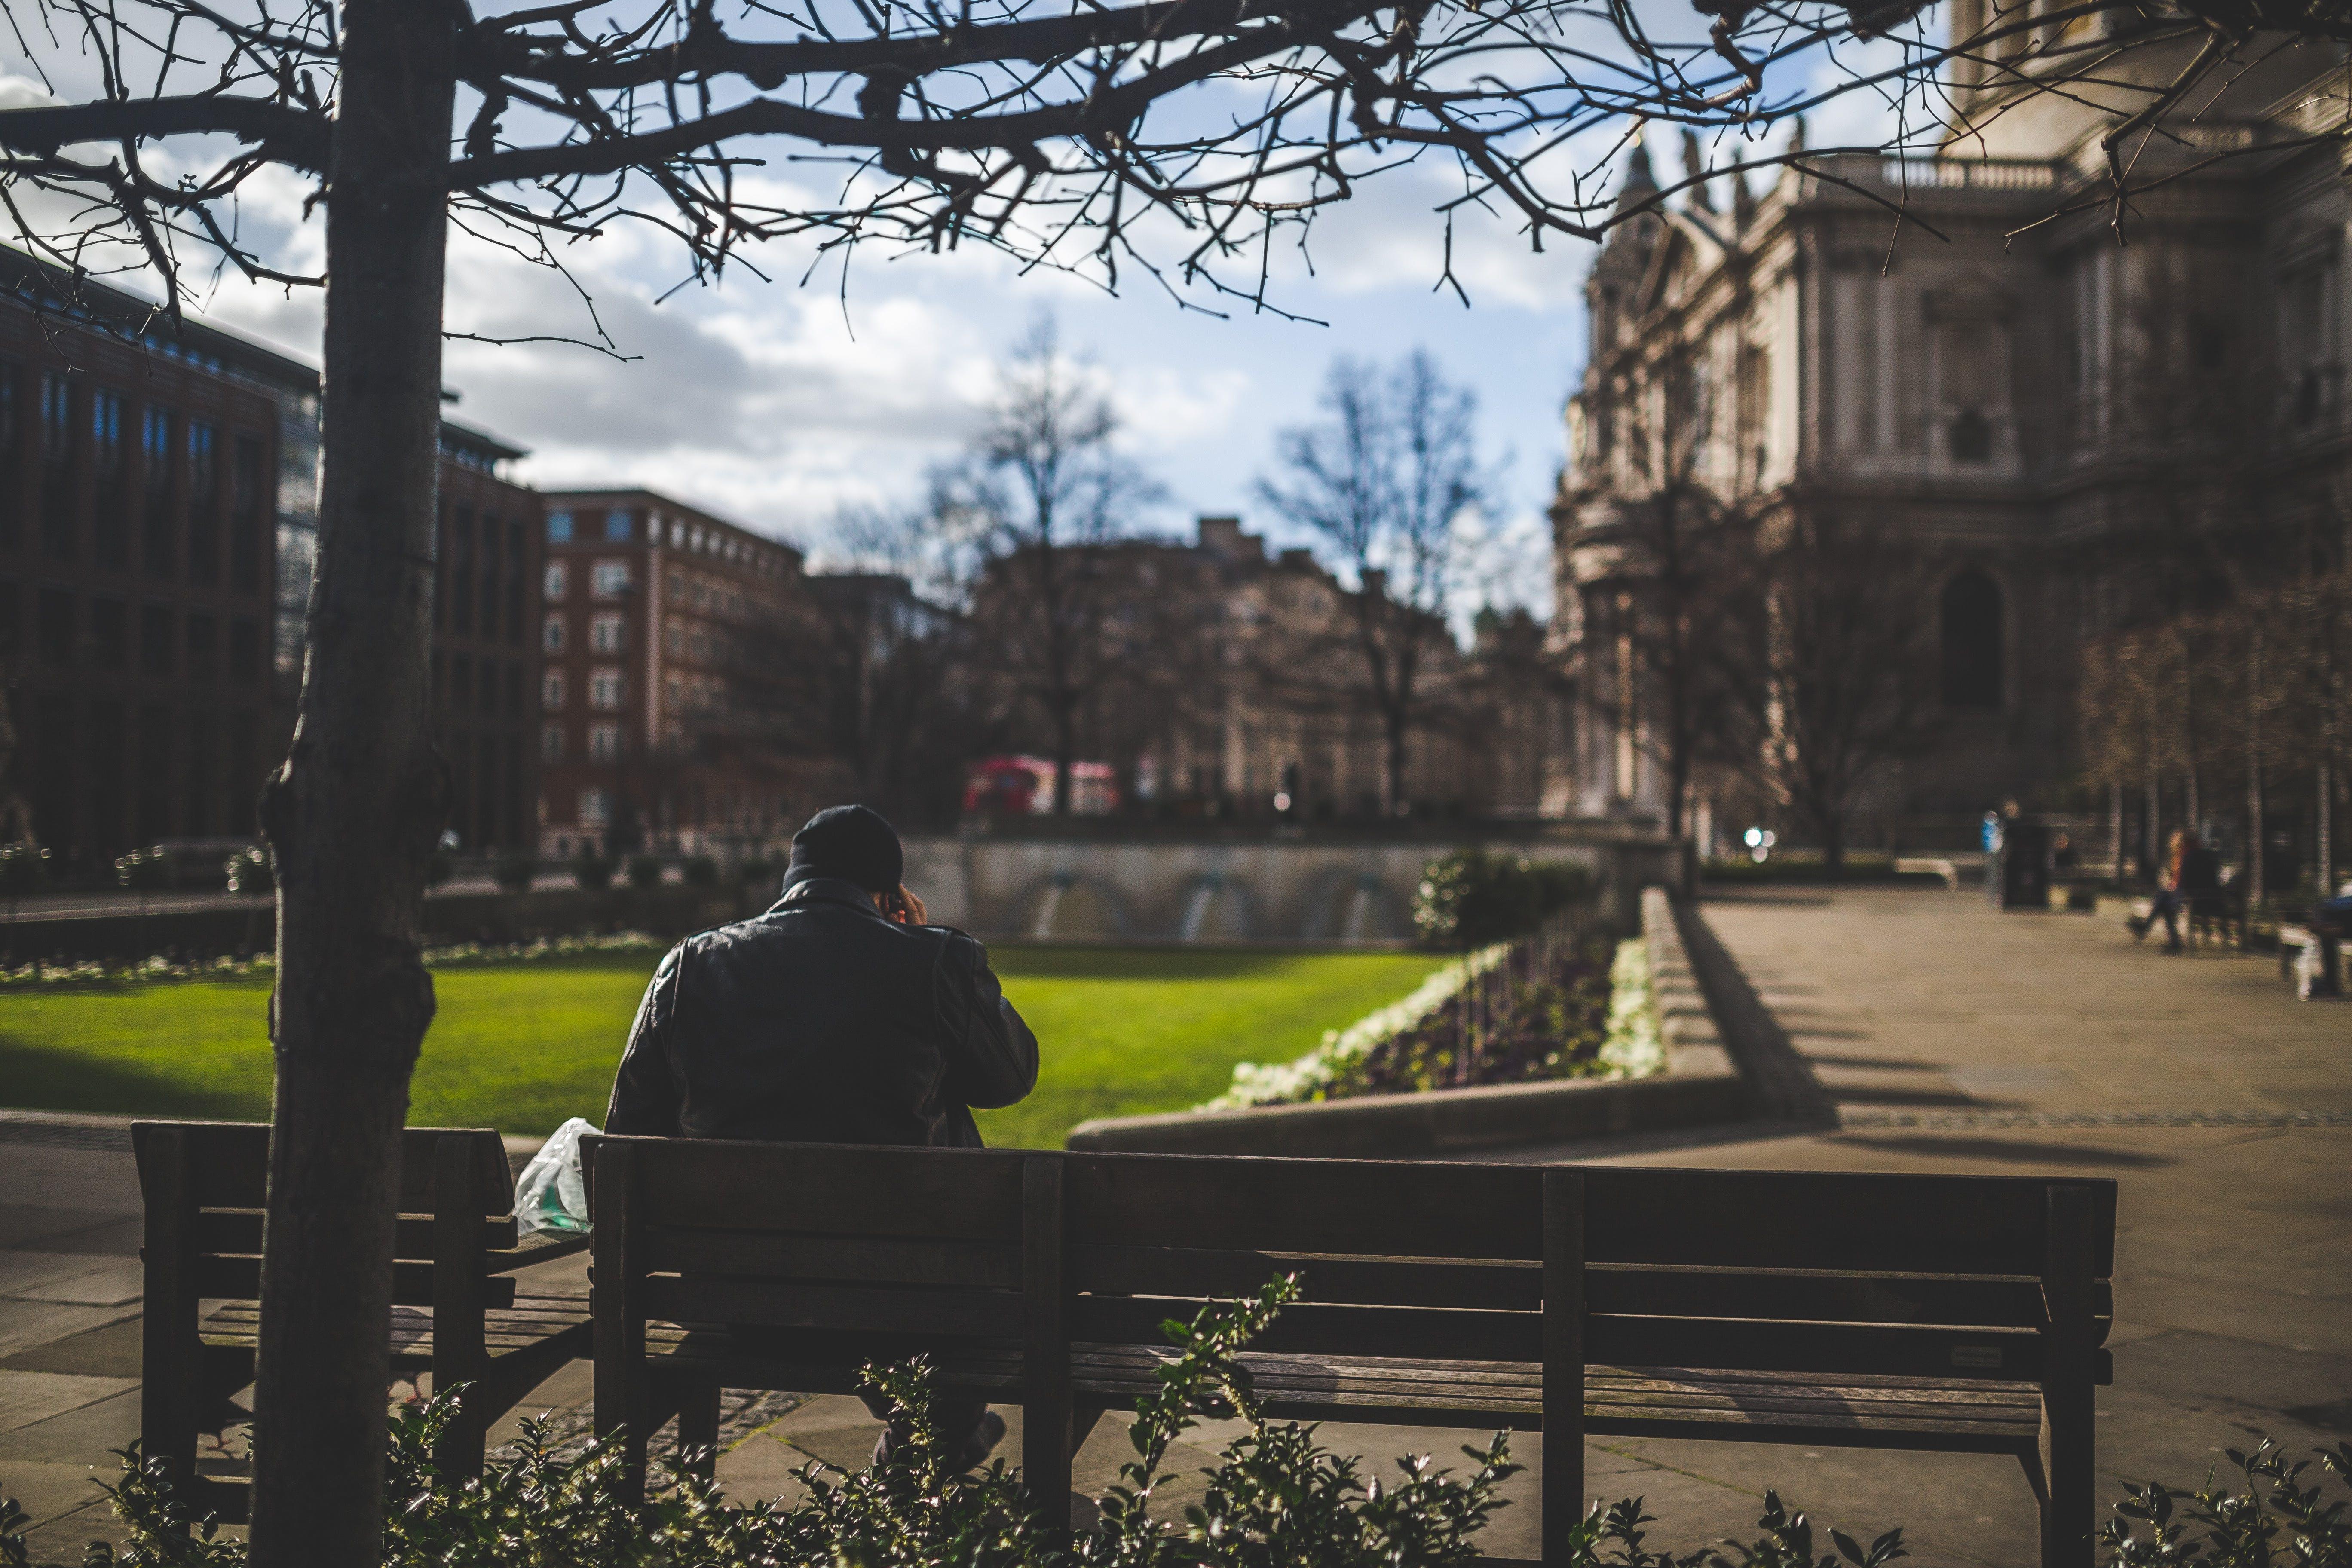 Man Sitting on Brown Wooden Bench during Daytime